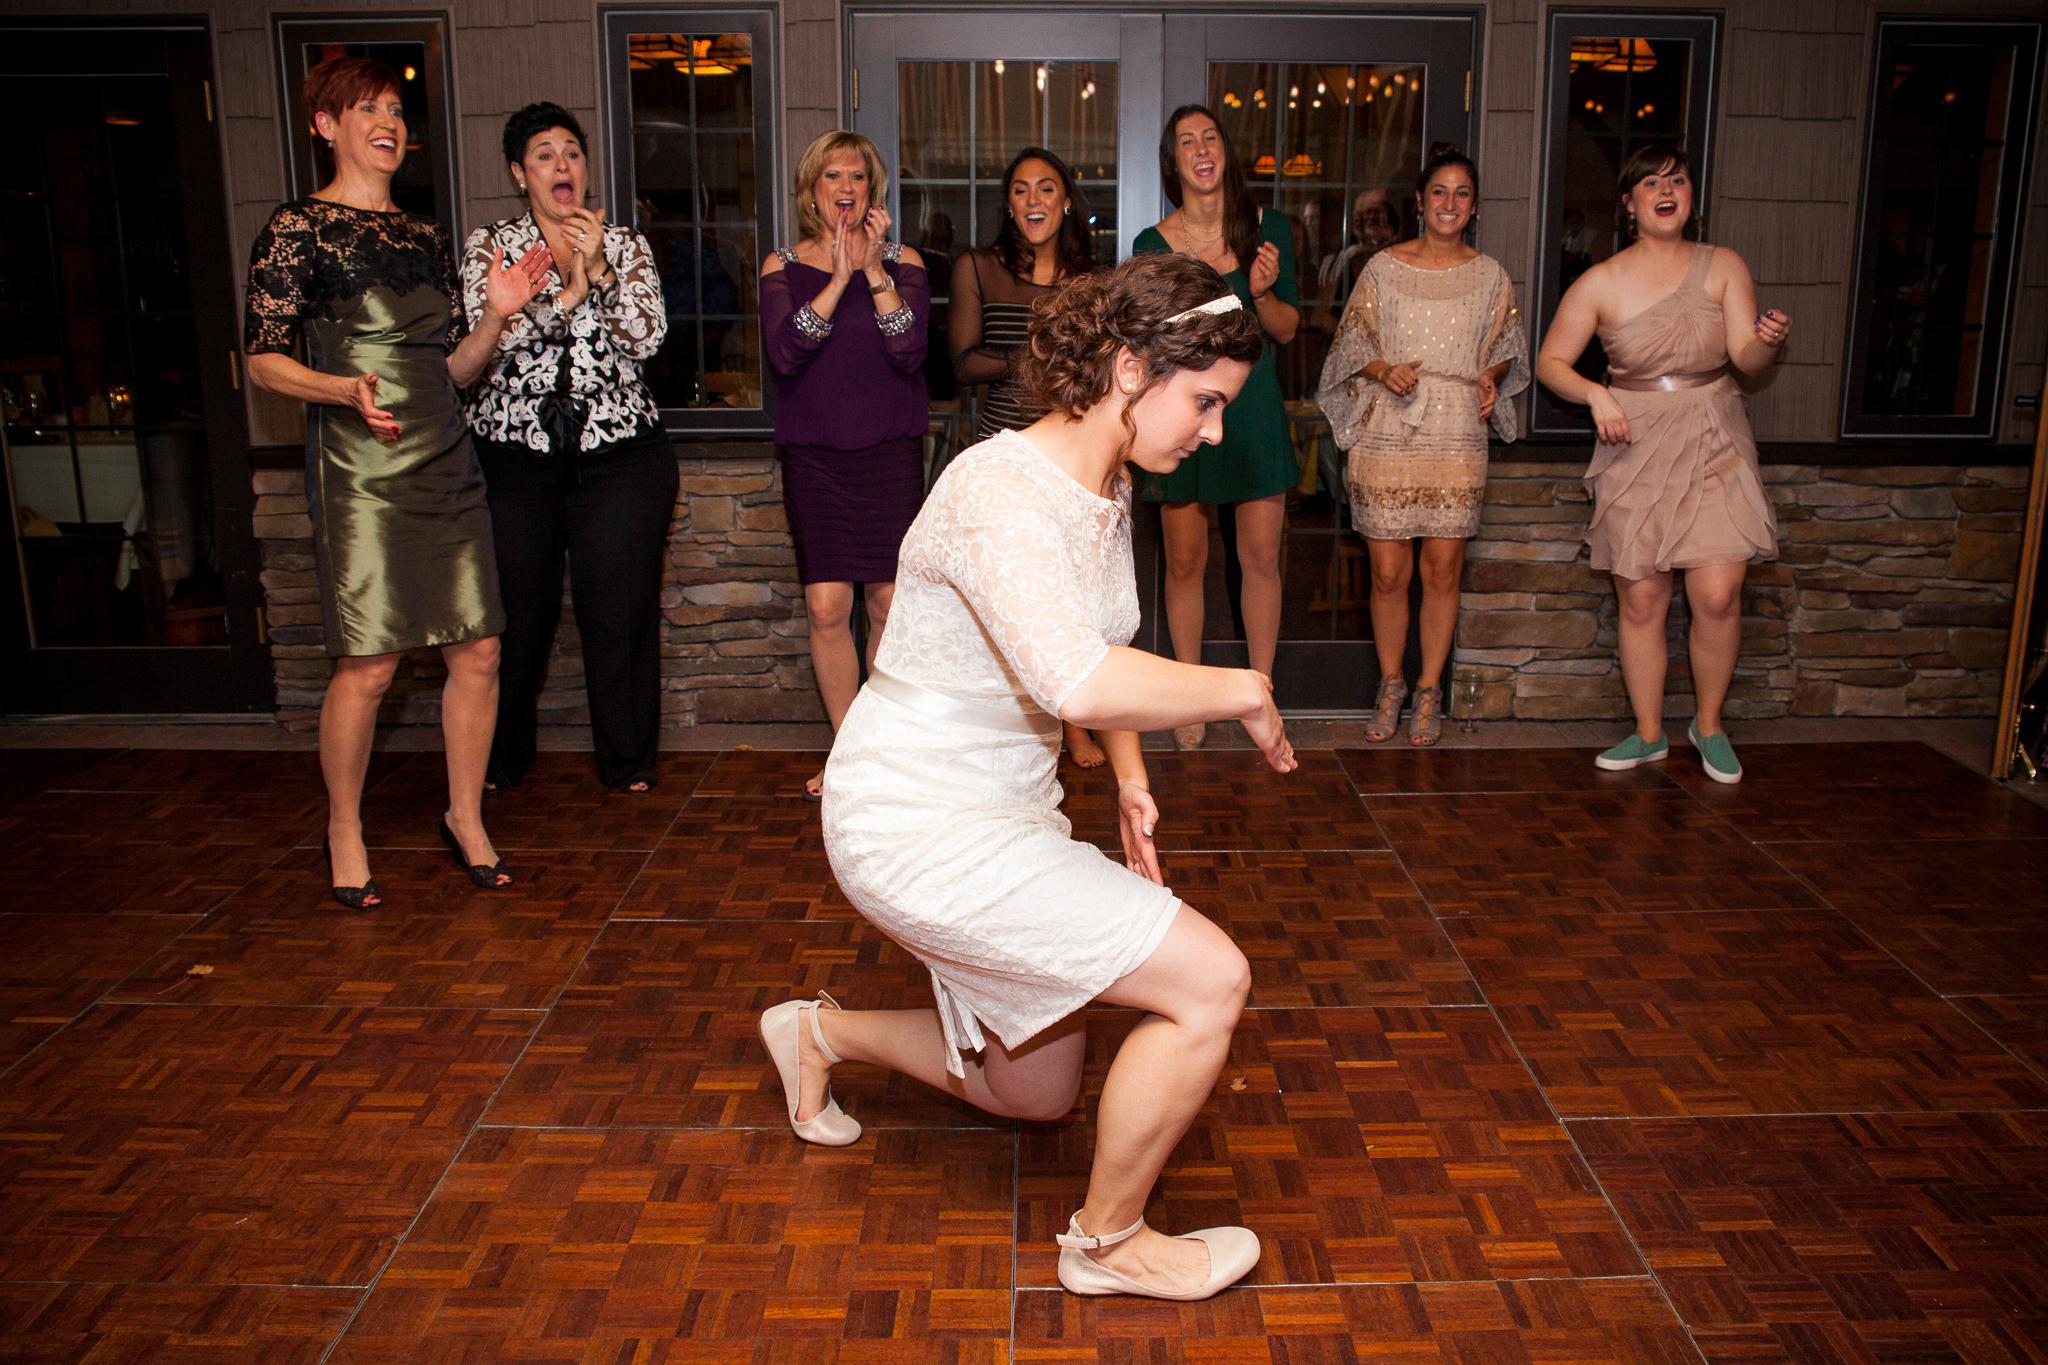 camuglia-whomstudio-chelsea_and_andy-nycphotographer-wedding-brooklyn-buffalo-timberlodge-141-0894.jpg